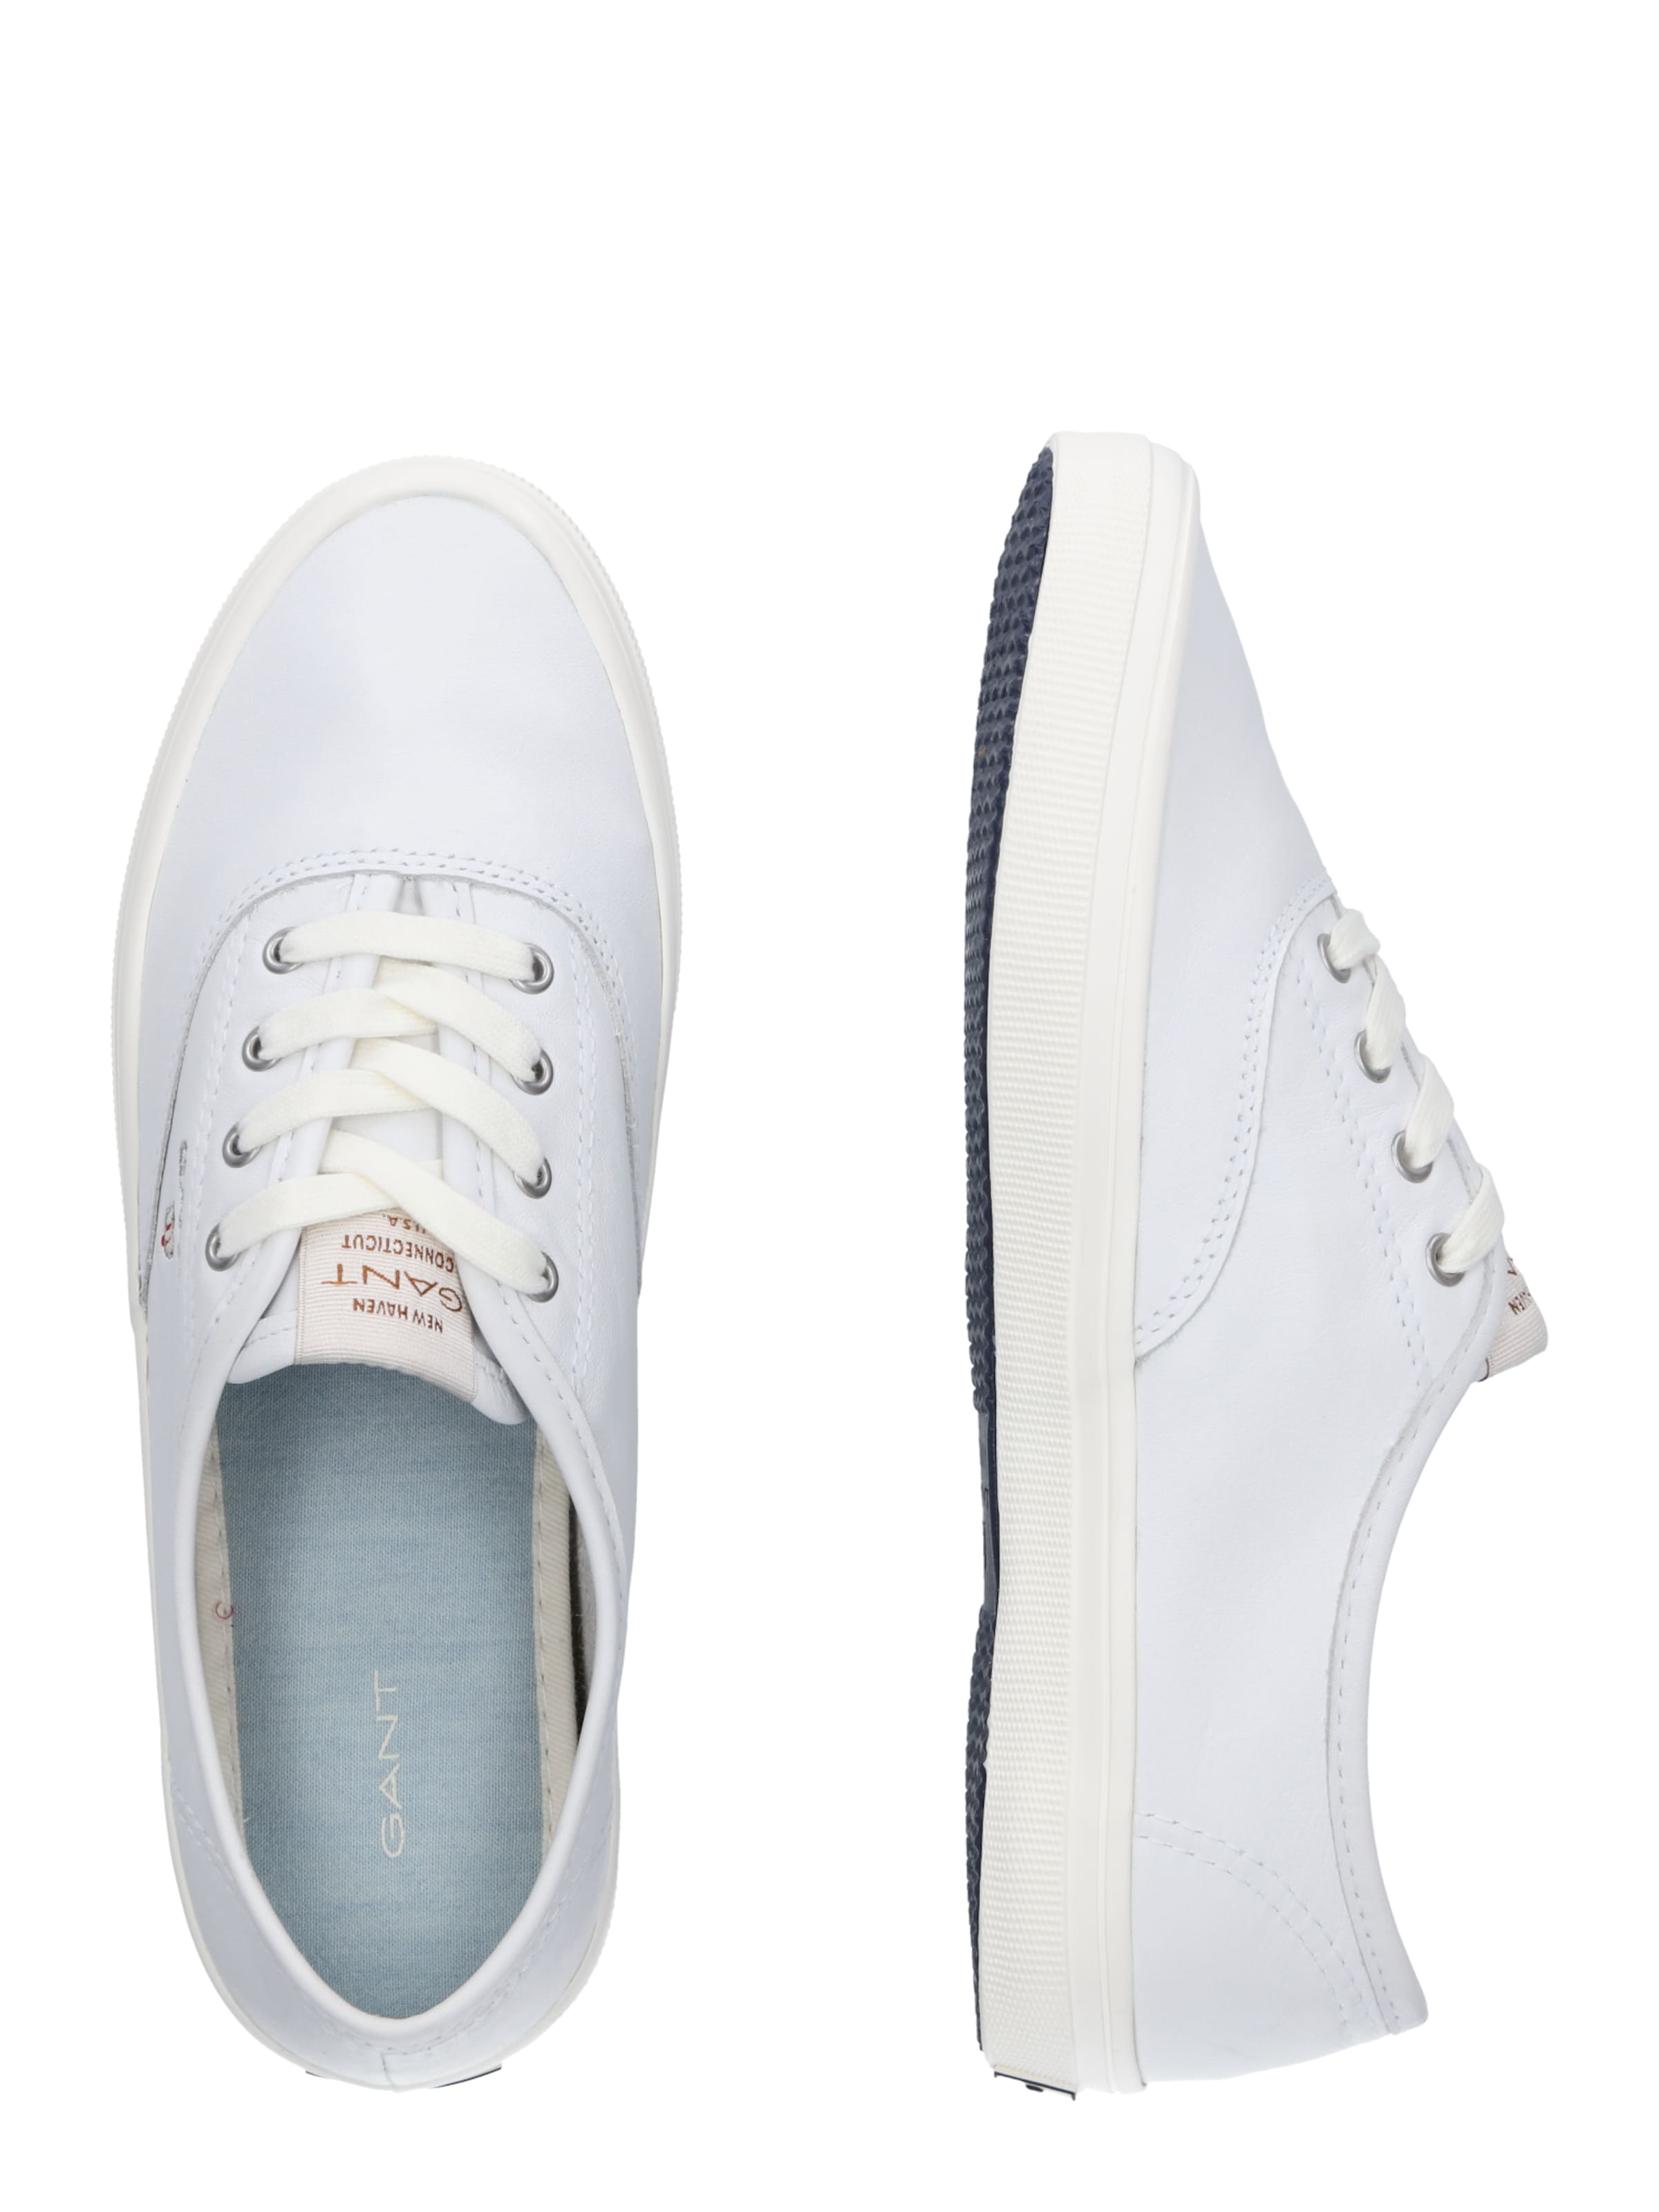 Weiß In Haven' Gant Sneaker 'new OiPZuTkX